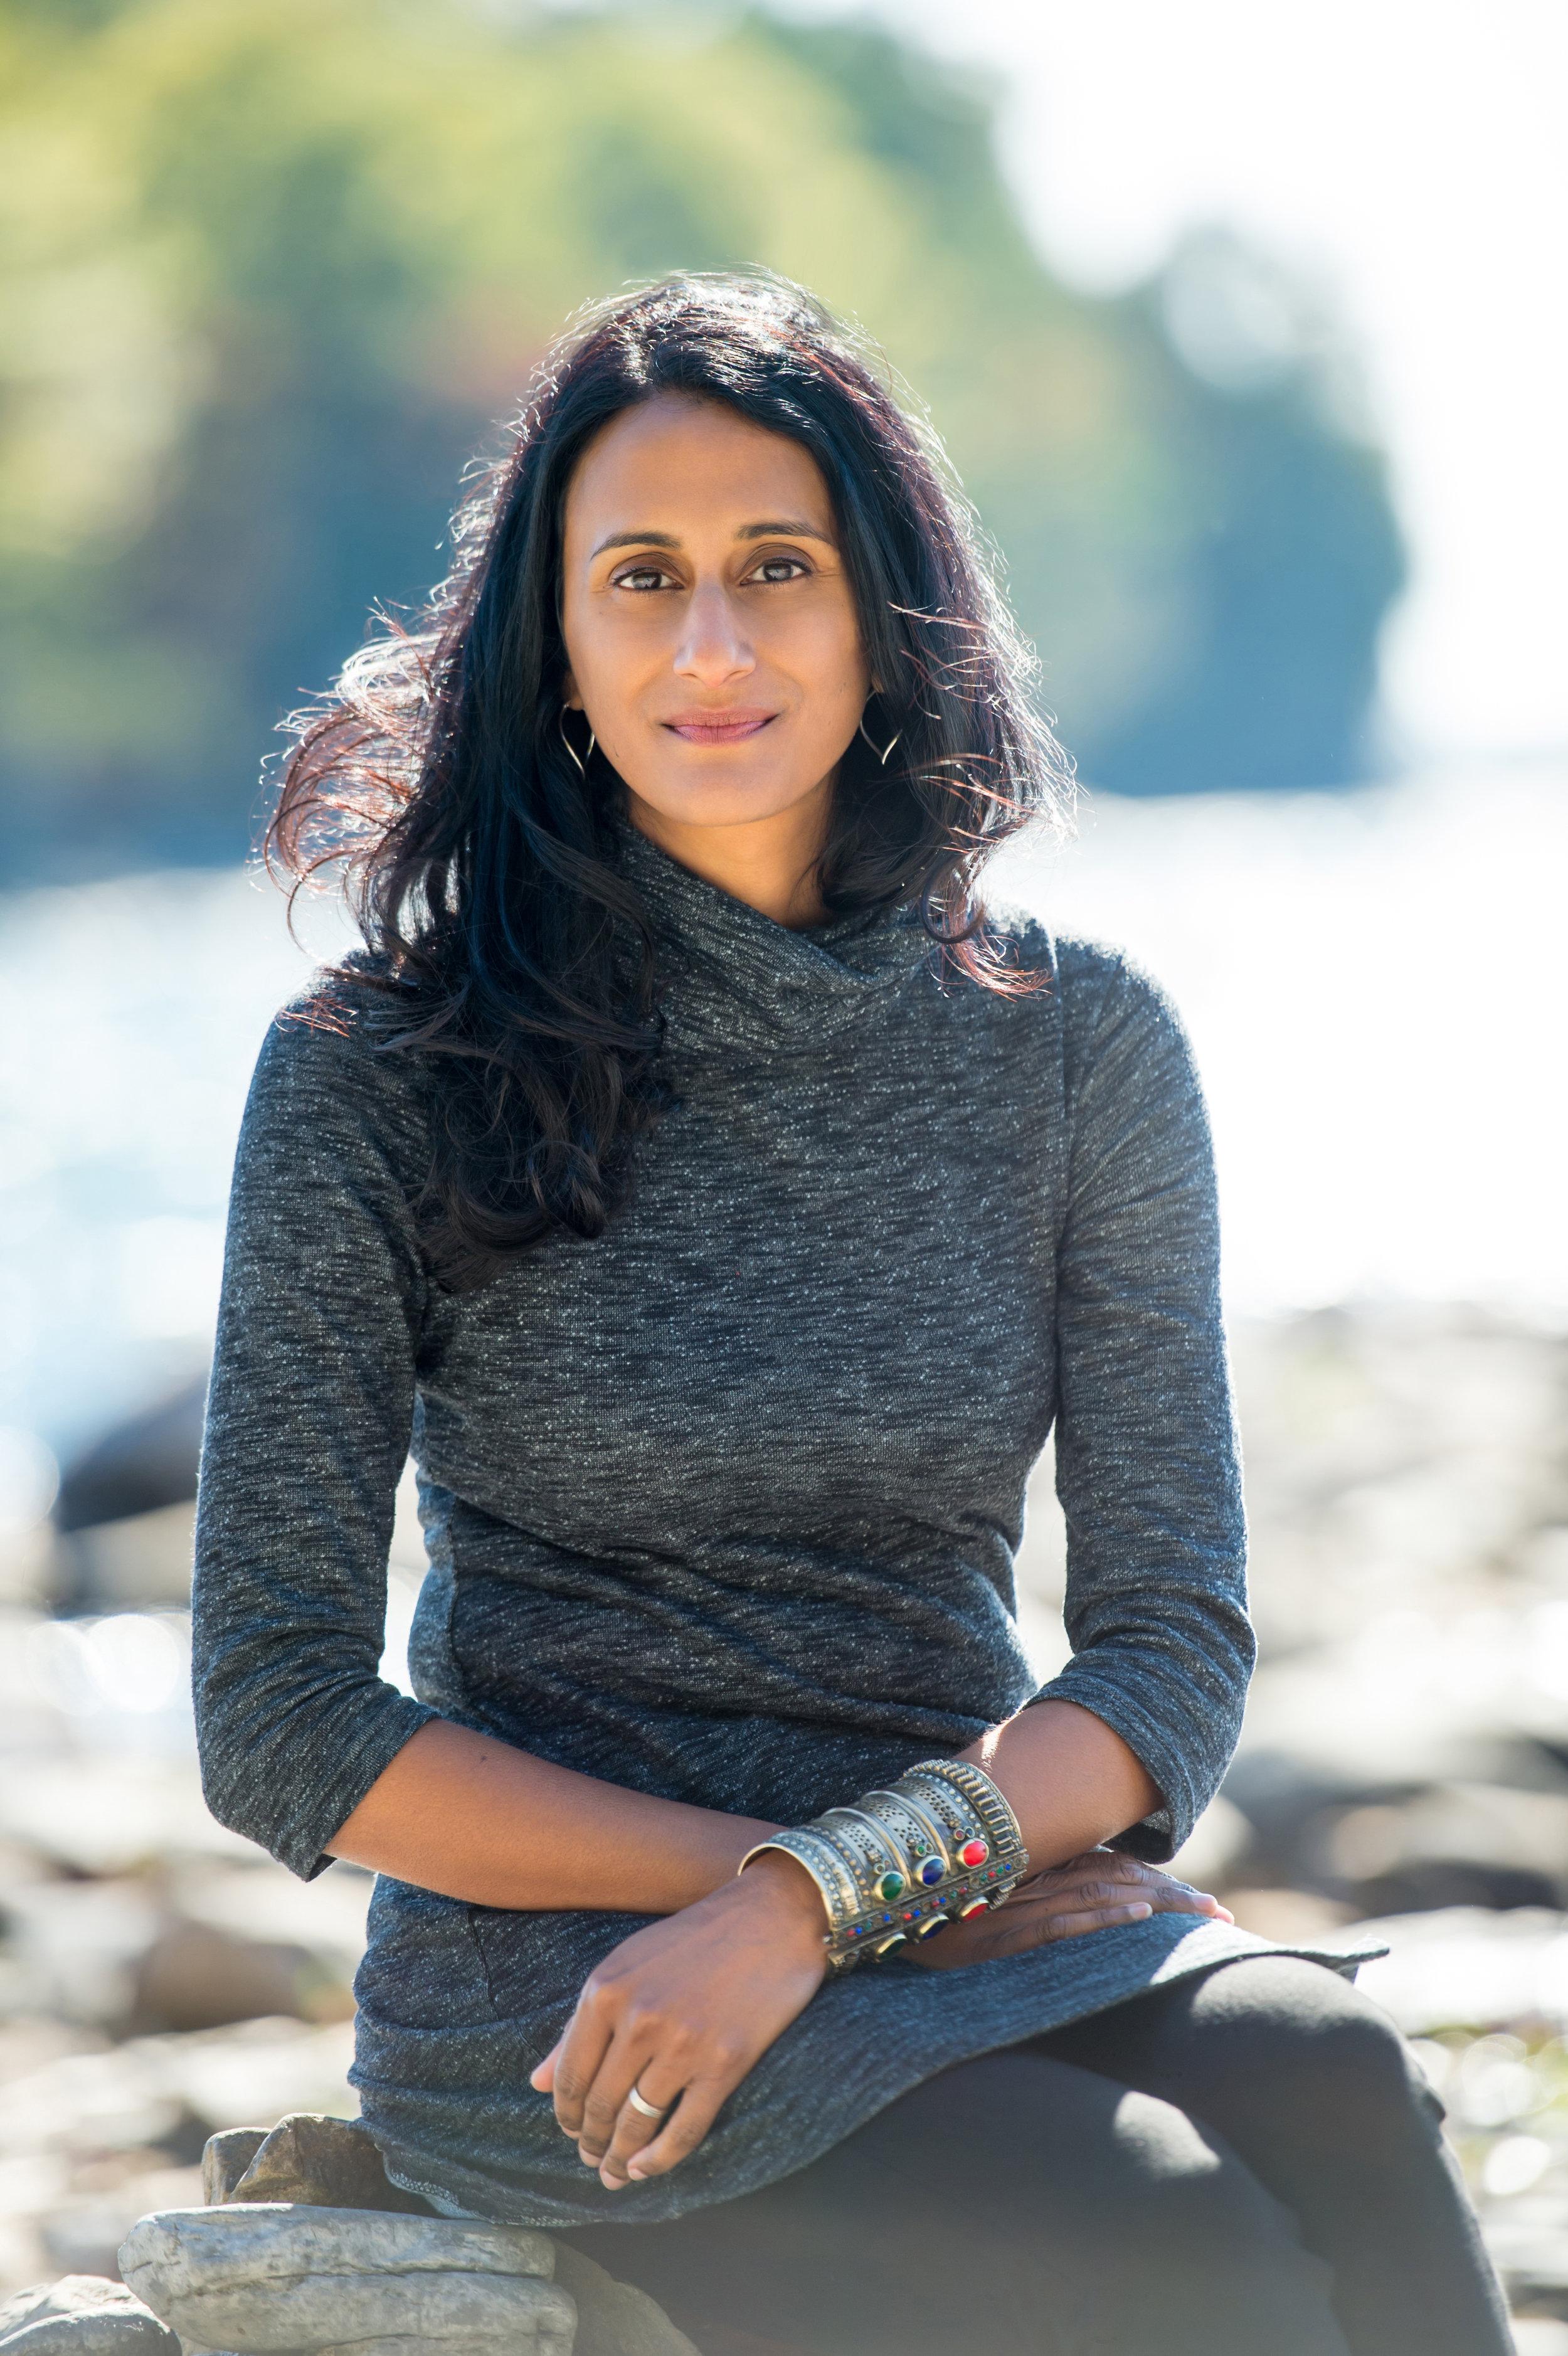 Author and policy expert Bina Venkataraman. Daria Bishop photograph